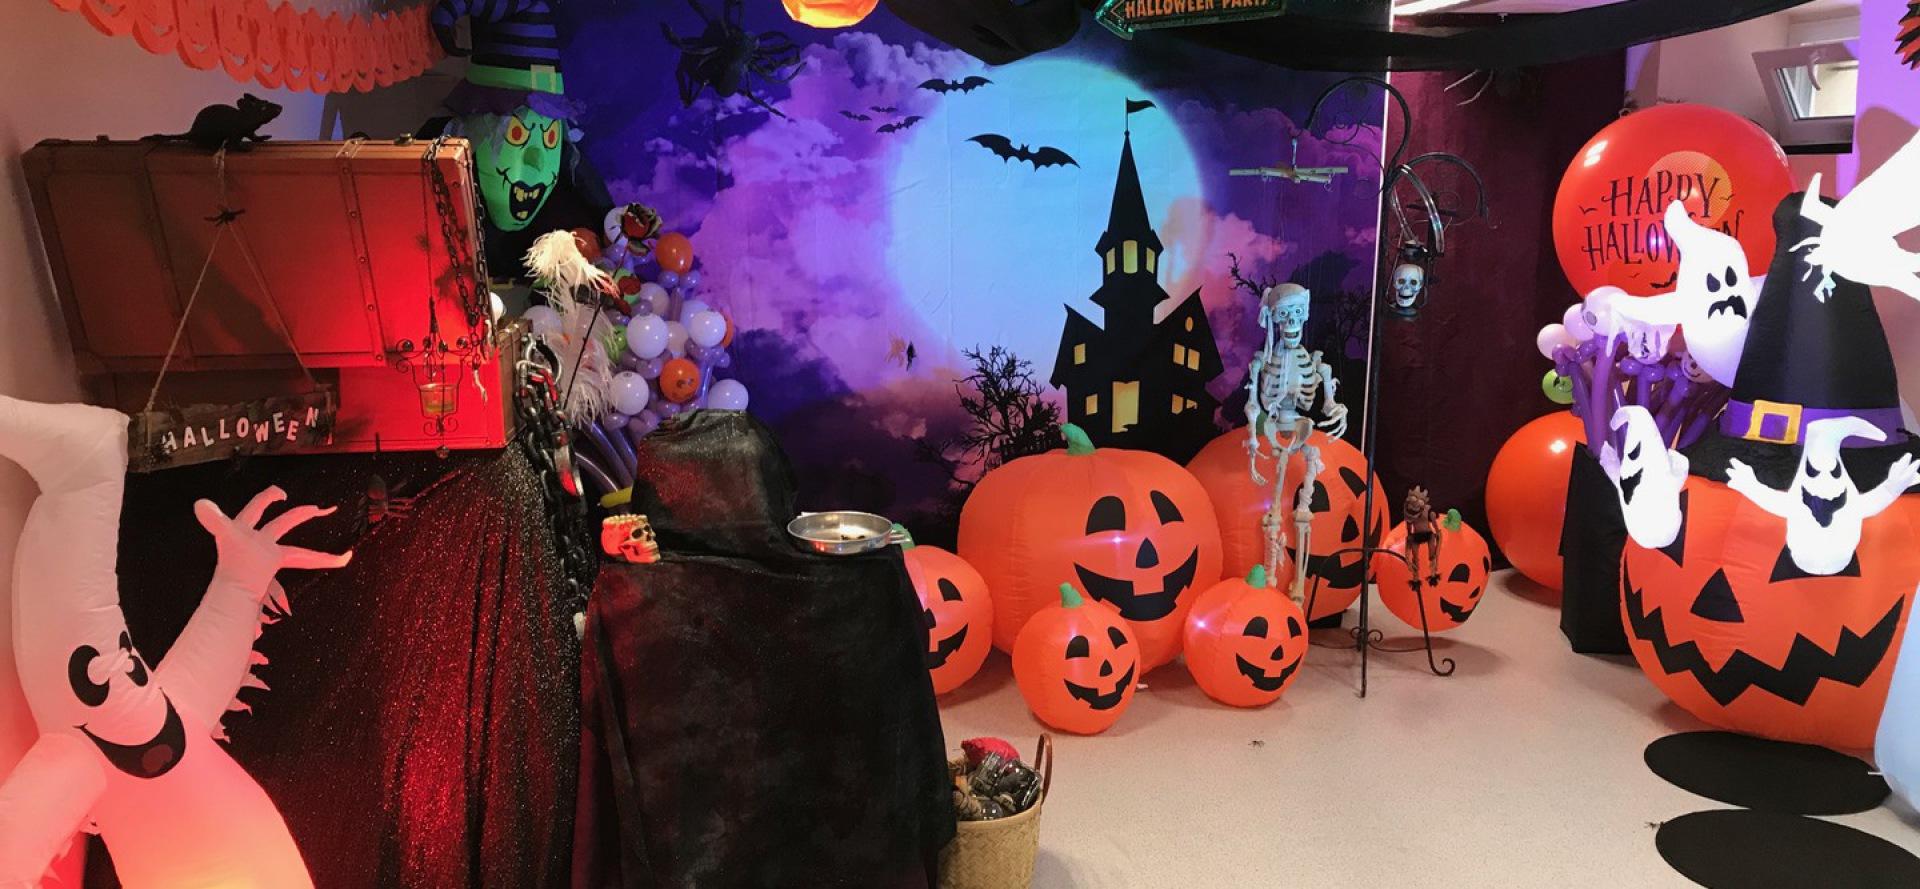 spectacle de magie et ballons spécial Halloween avec Fabrizio  à Marseille, Halloween Show by Fabrizio international Balloon Artist